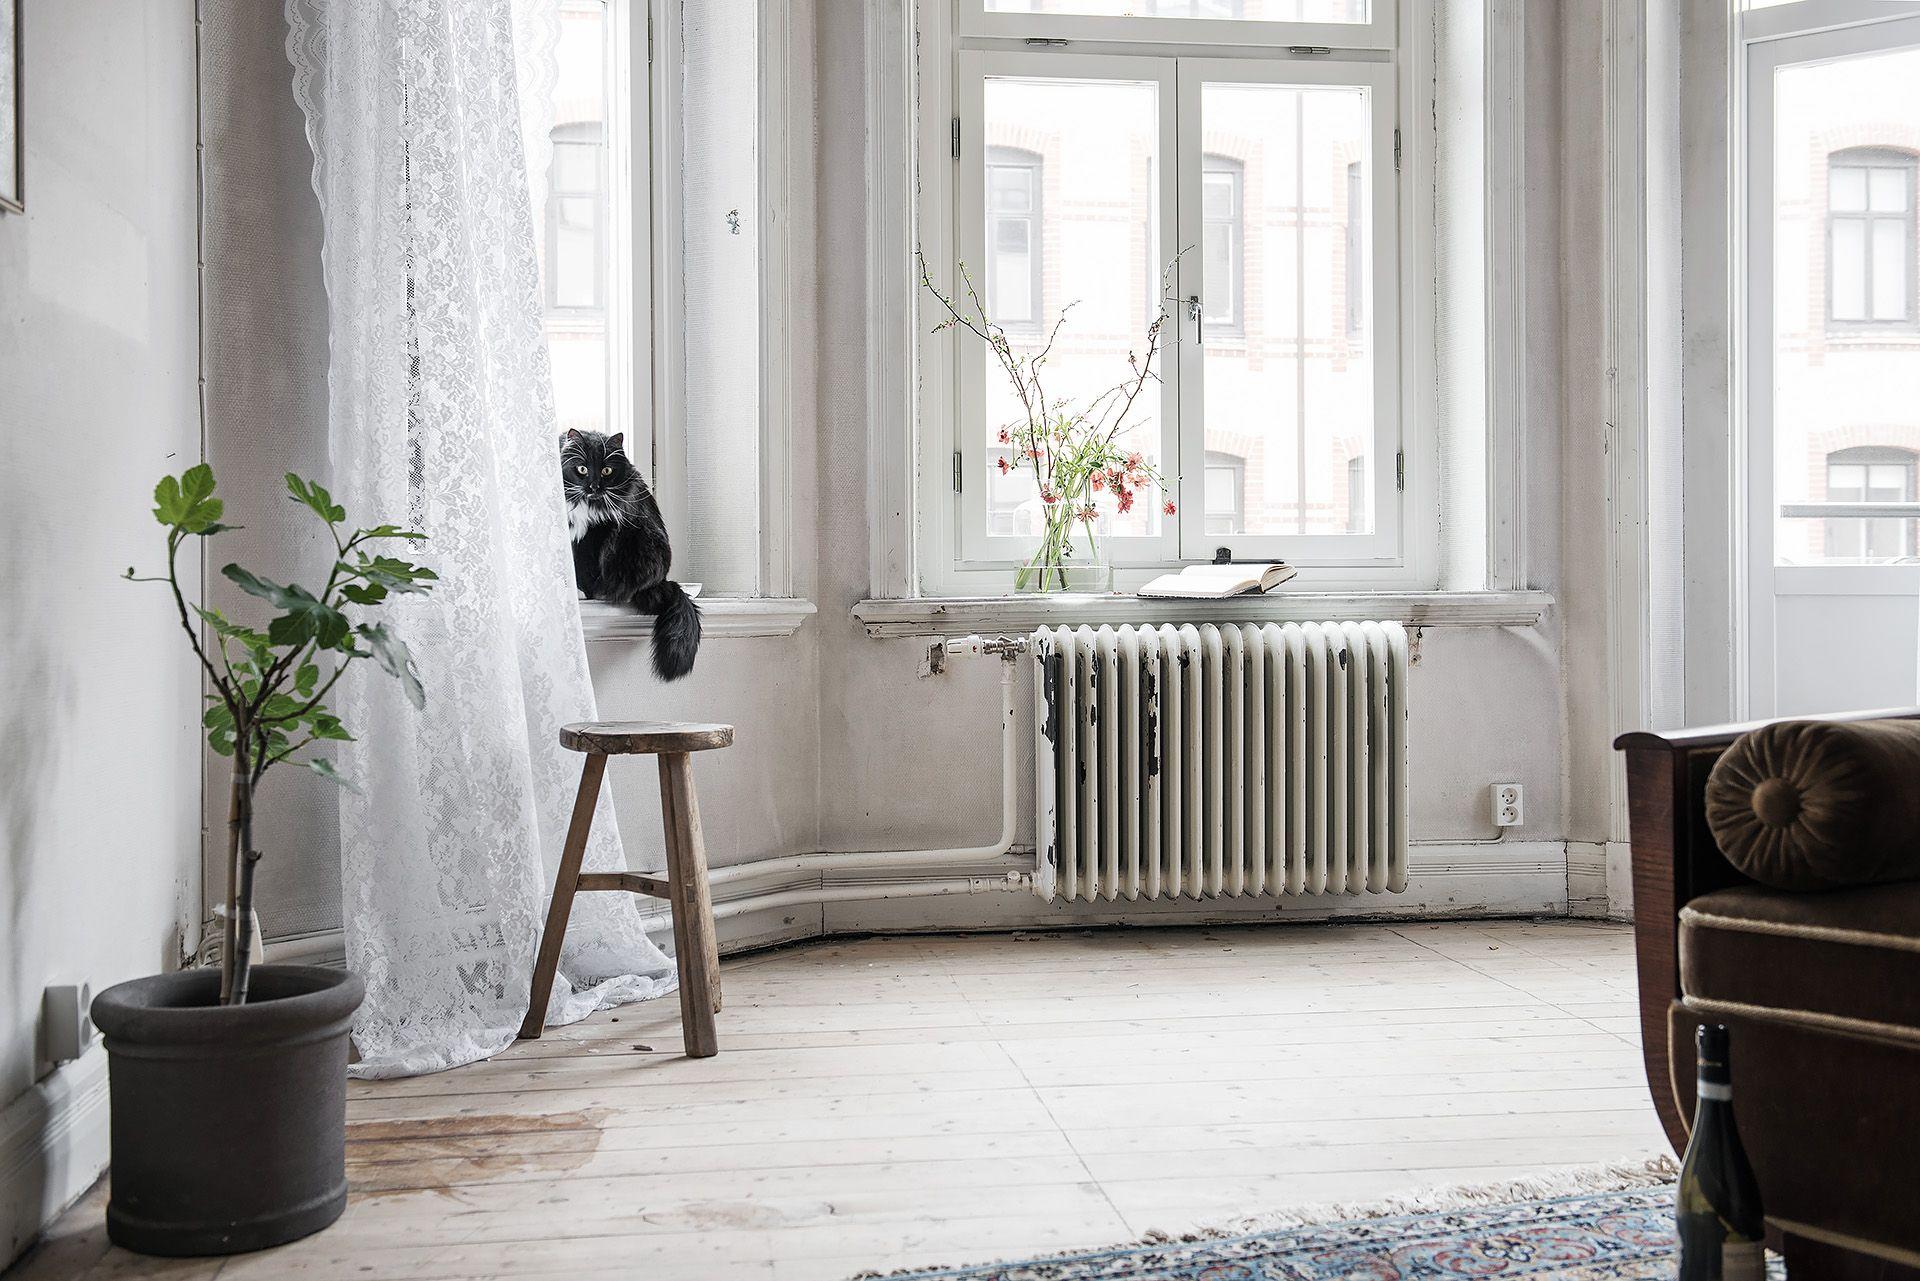 Home design bilder interieur sveagatan   home desining  pinterest  scandinavian interior